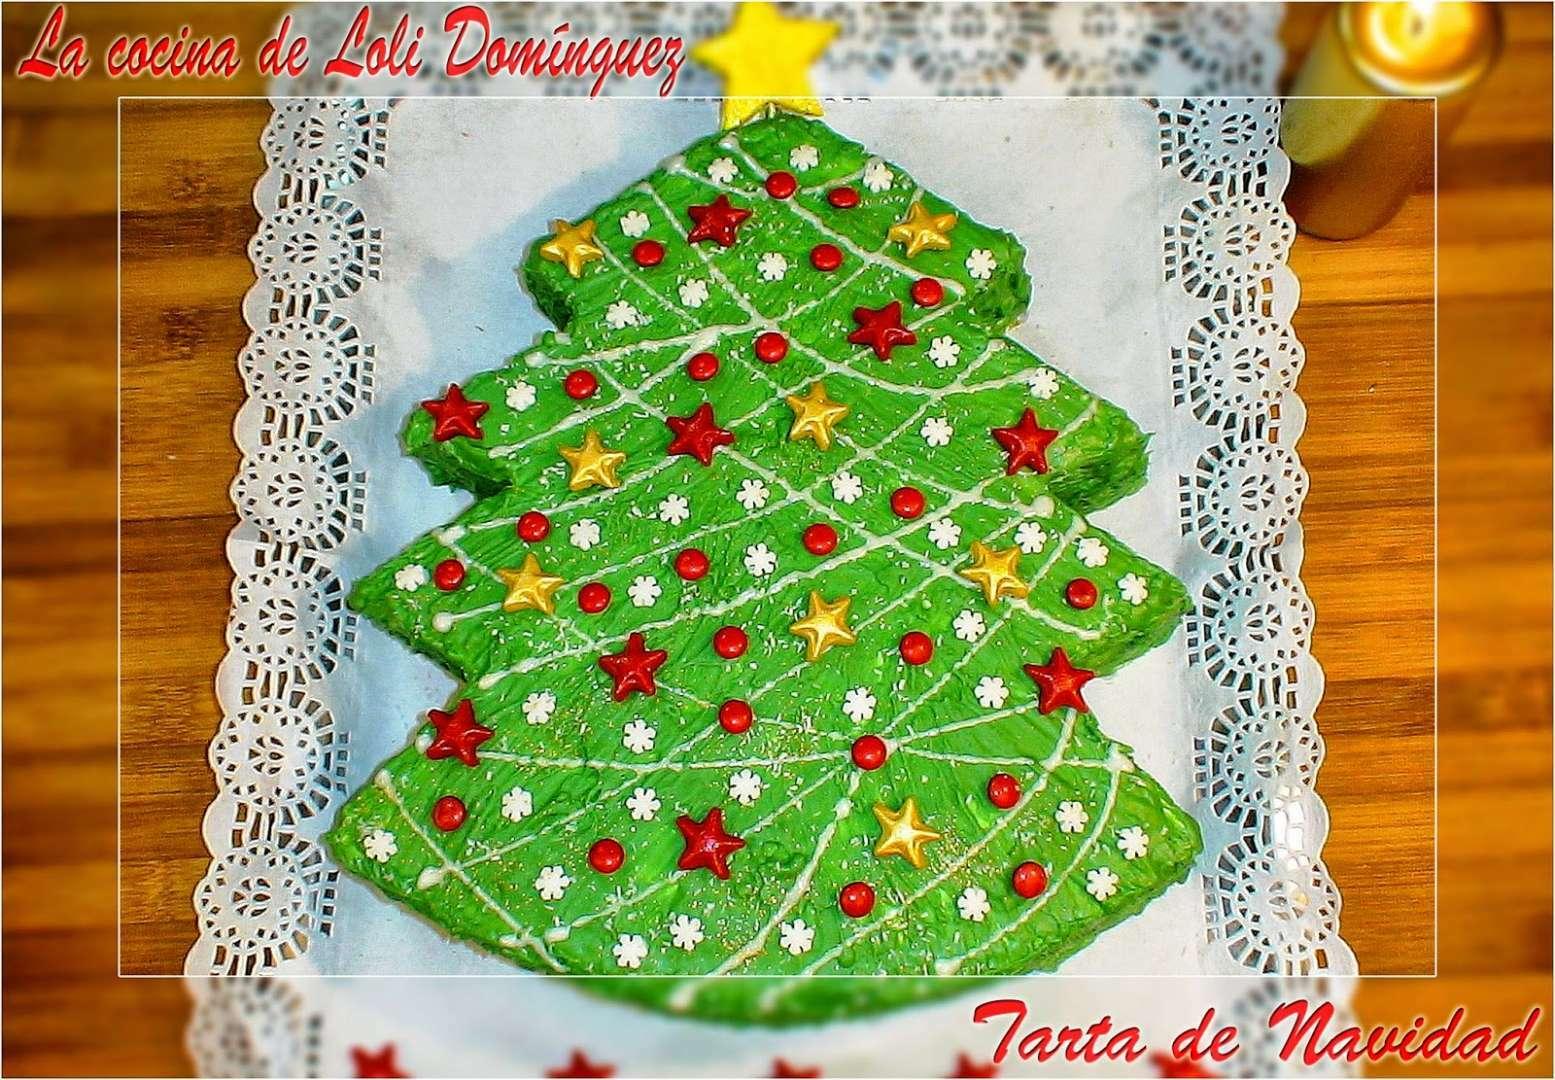 Tarta De Navidad Receta Petitchef